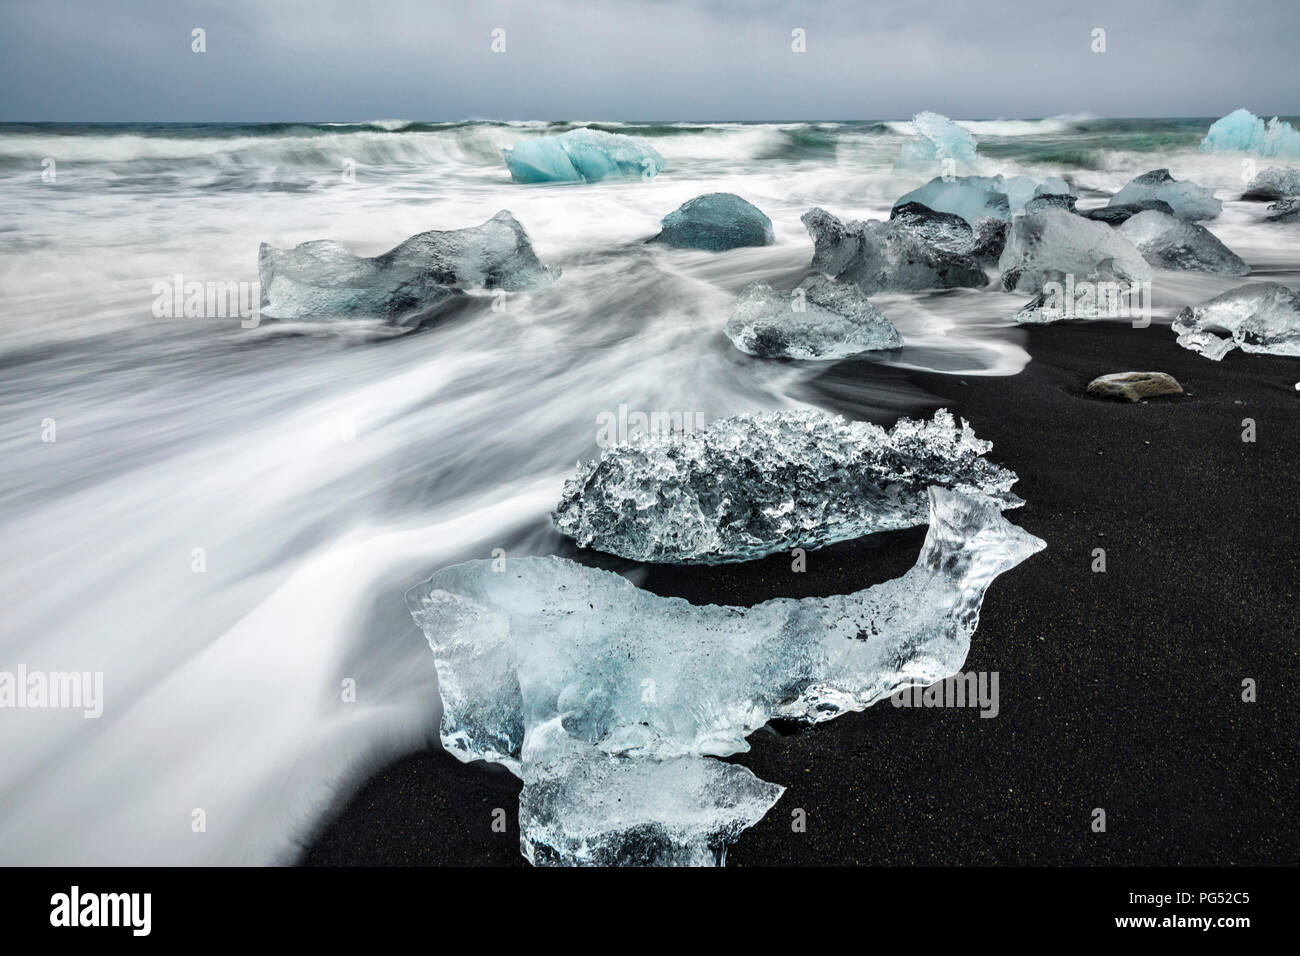 Iceblocks at the black sand beach, Jokulsarlon glacier - Stock Image